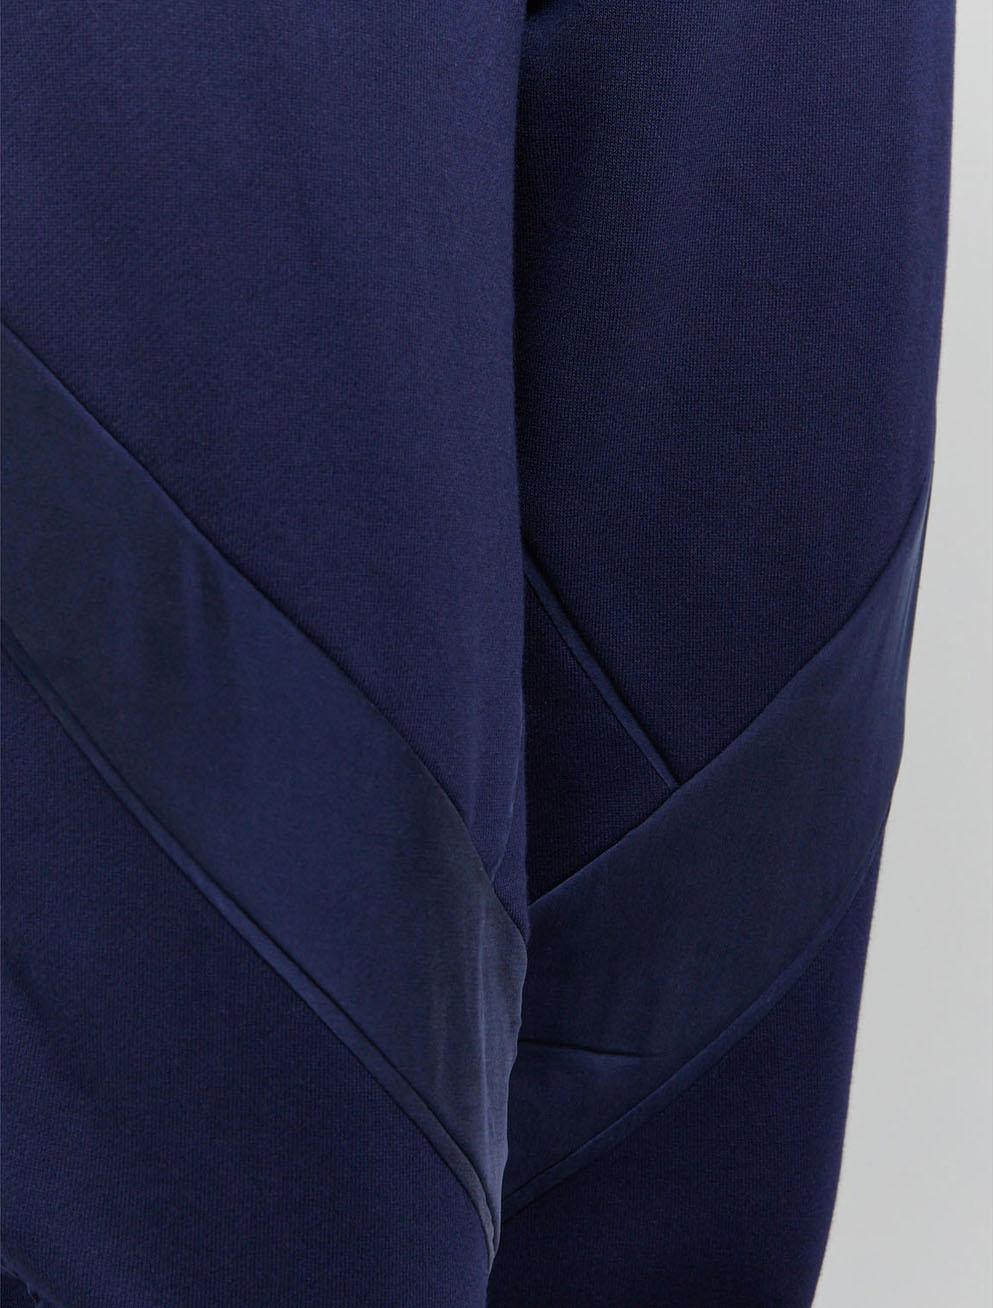 Peace silk panel sweatpants